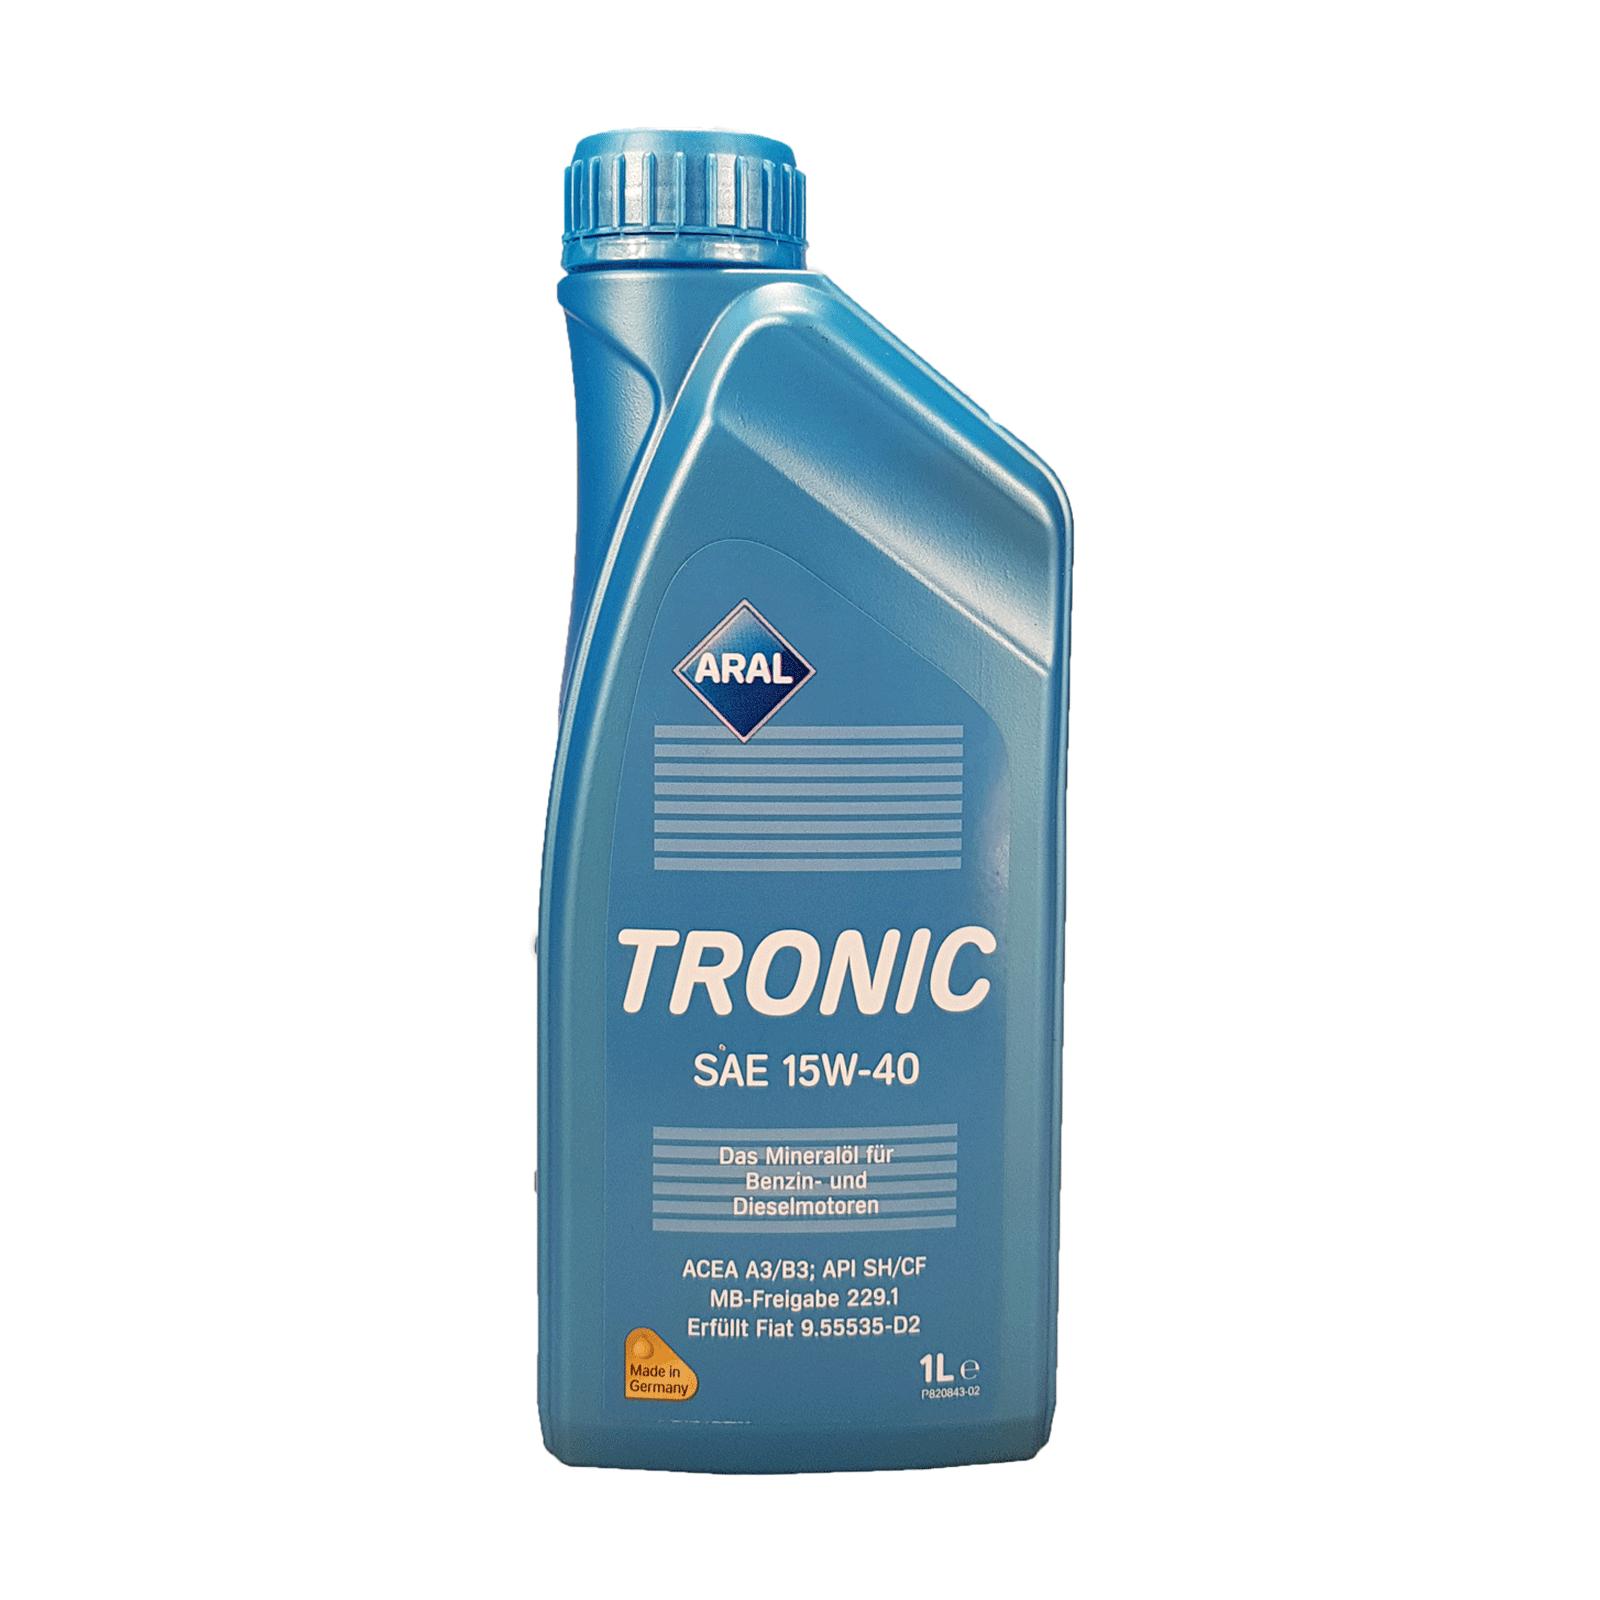 Aral Tronic 15W-40 - 1 Liter – Bild 1